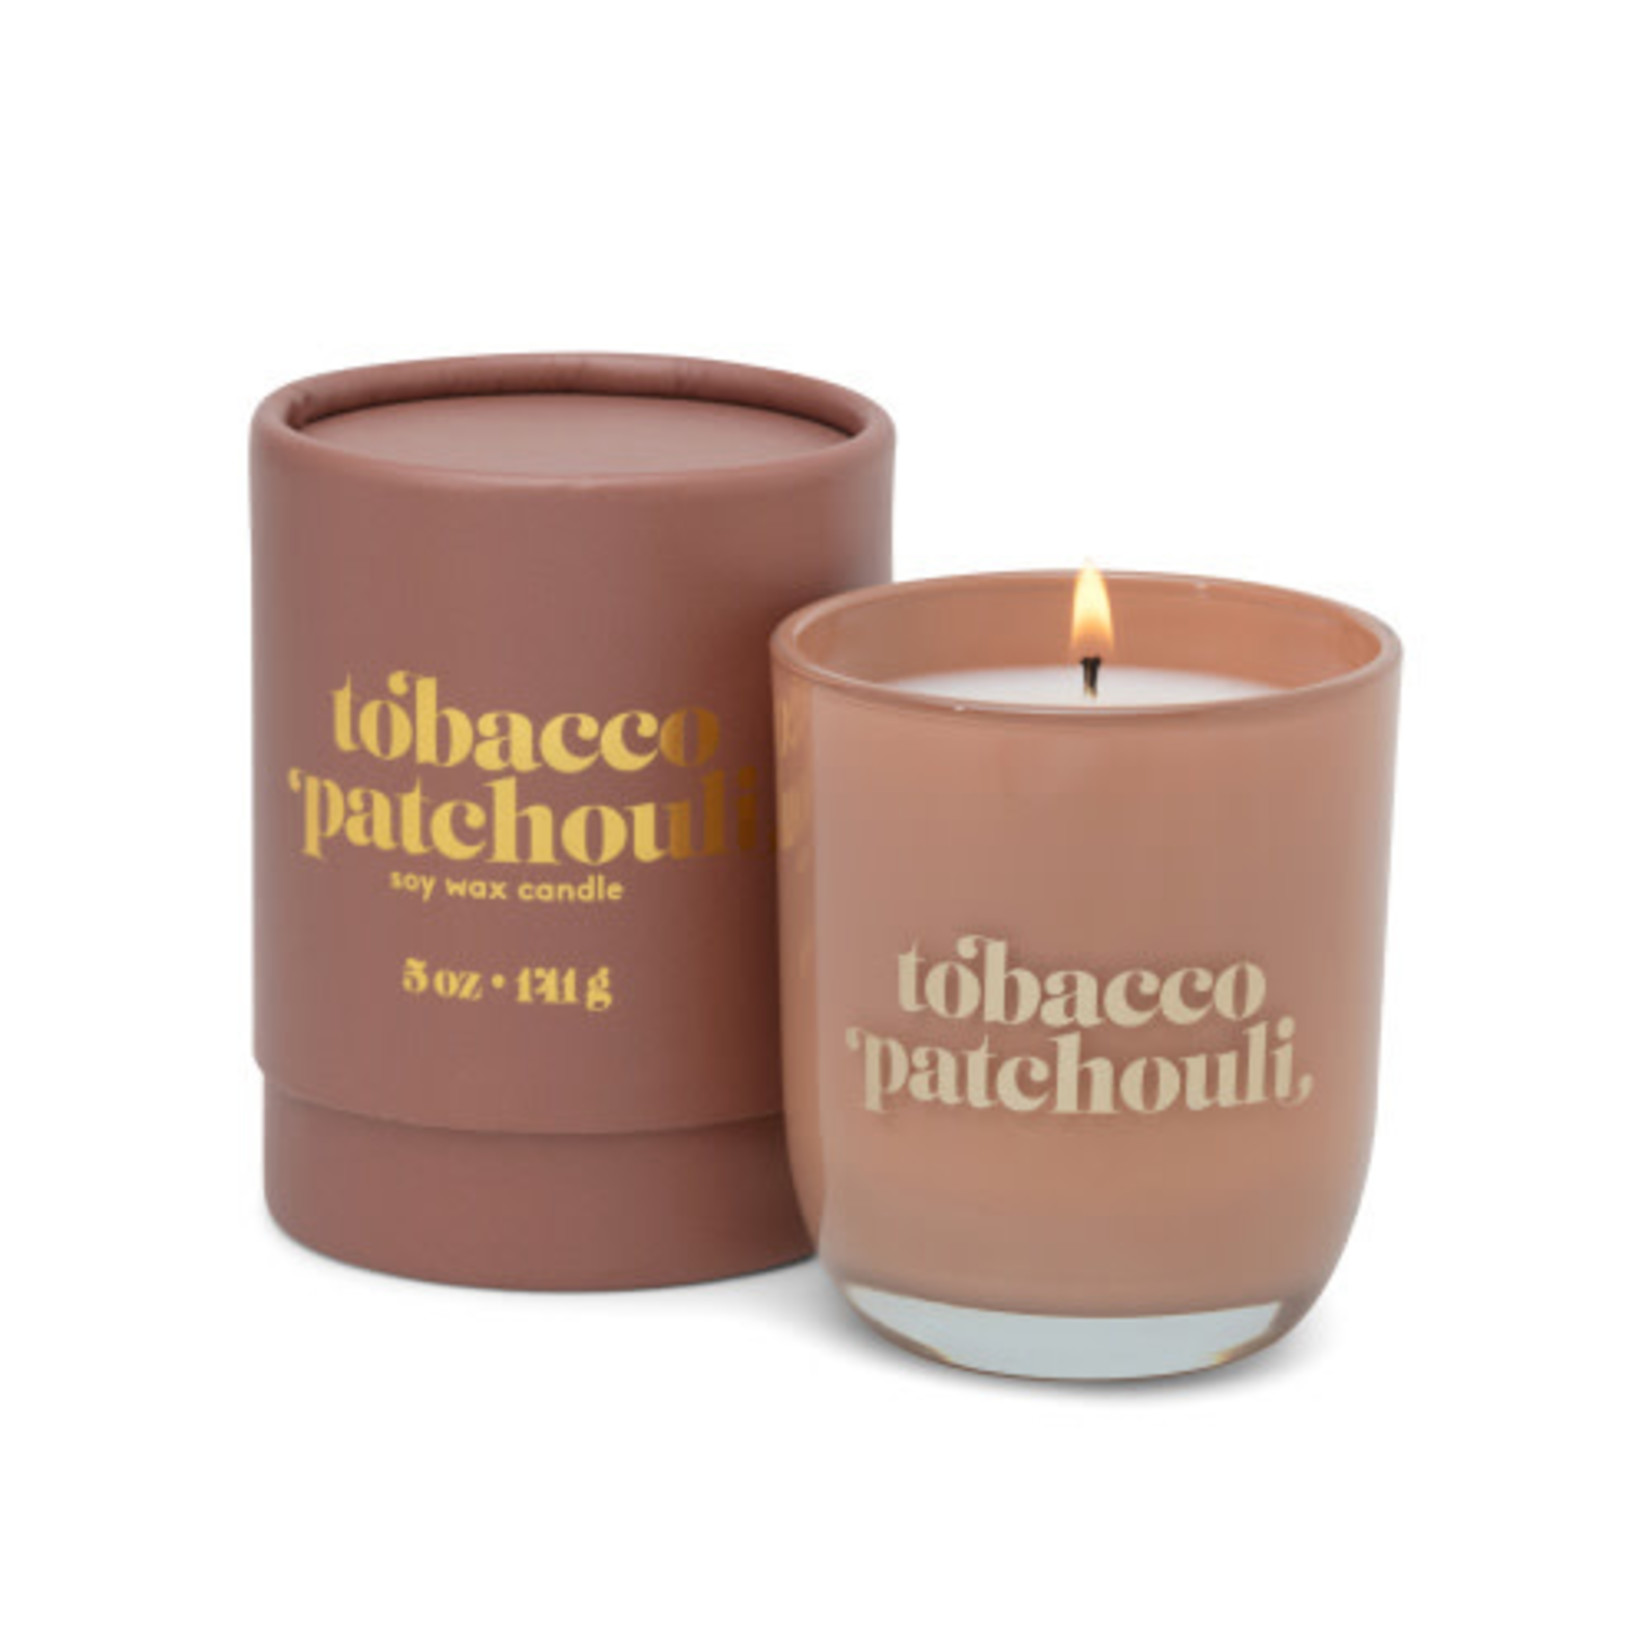 Petite Candle, Tobacco & Patchouli